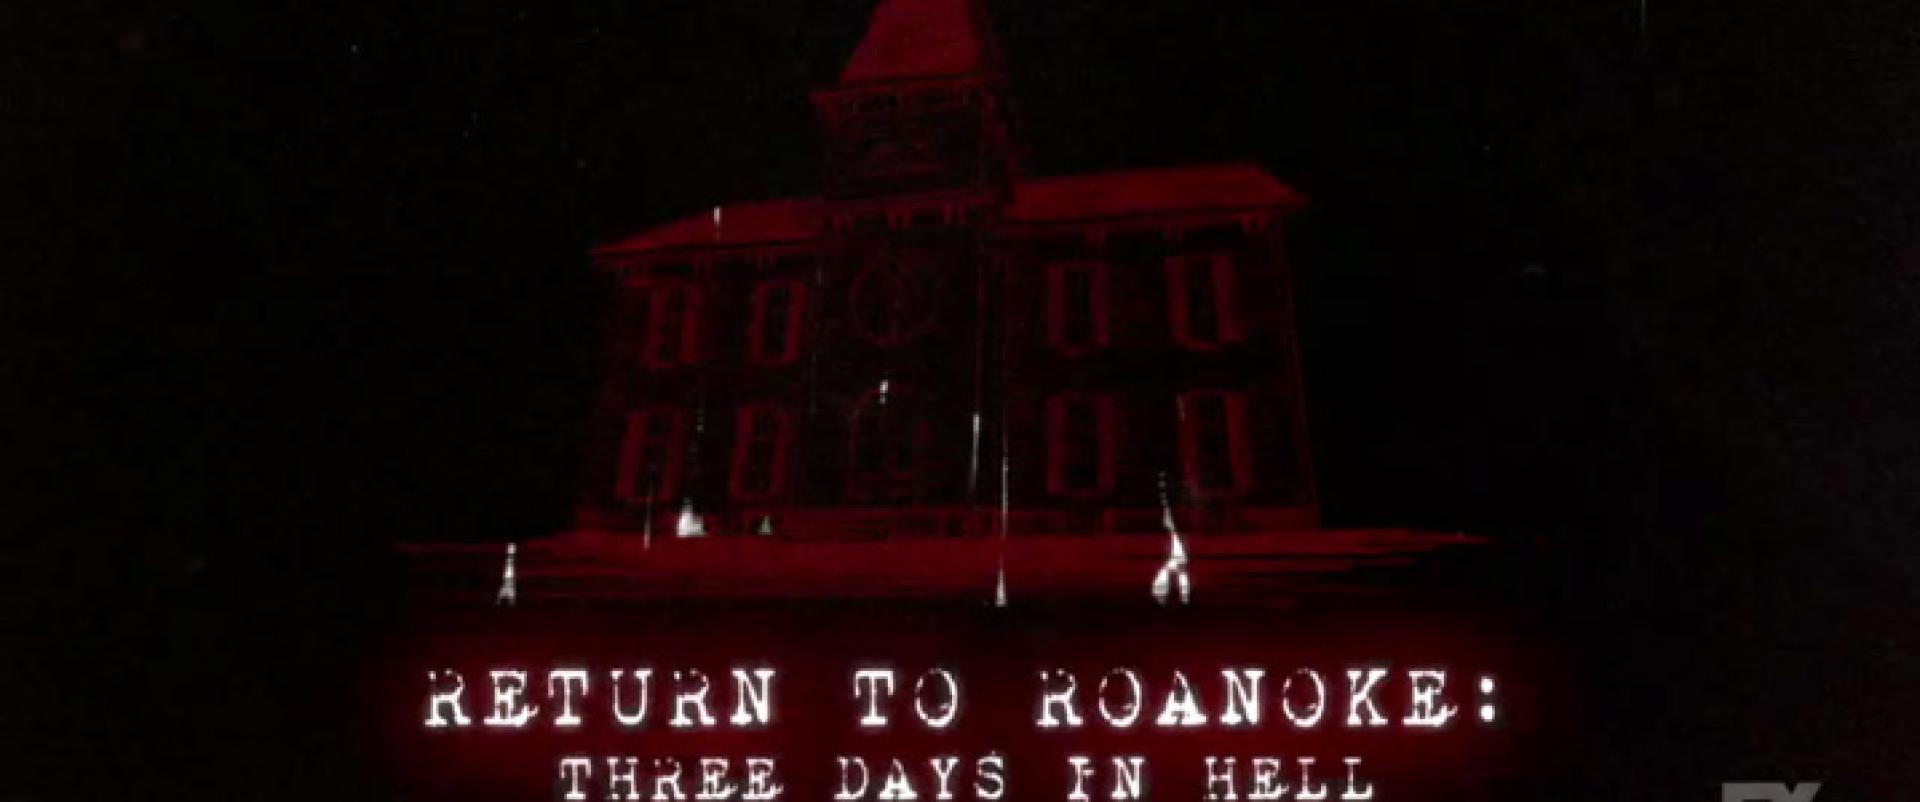 American Horror Story 6x07